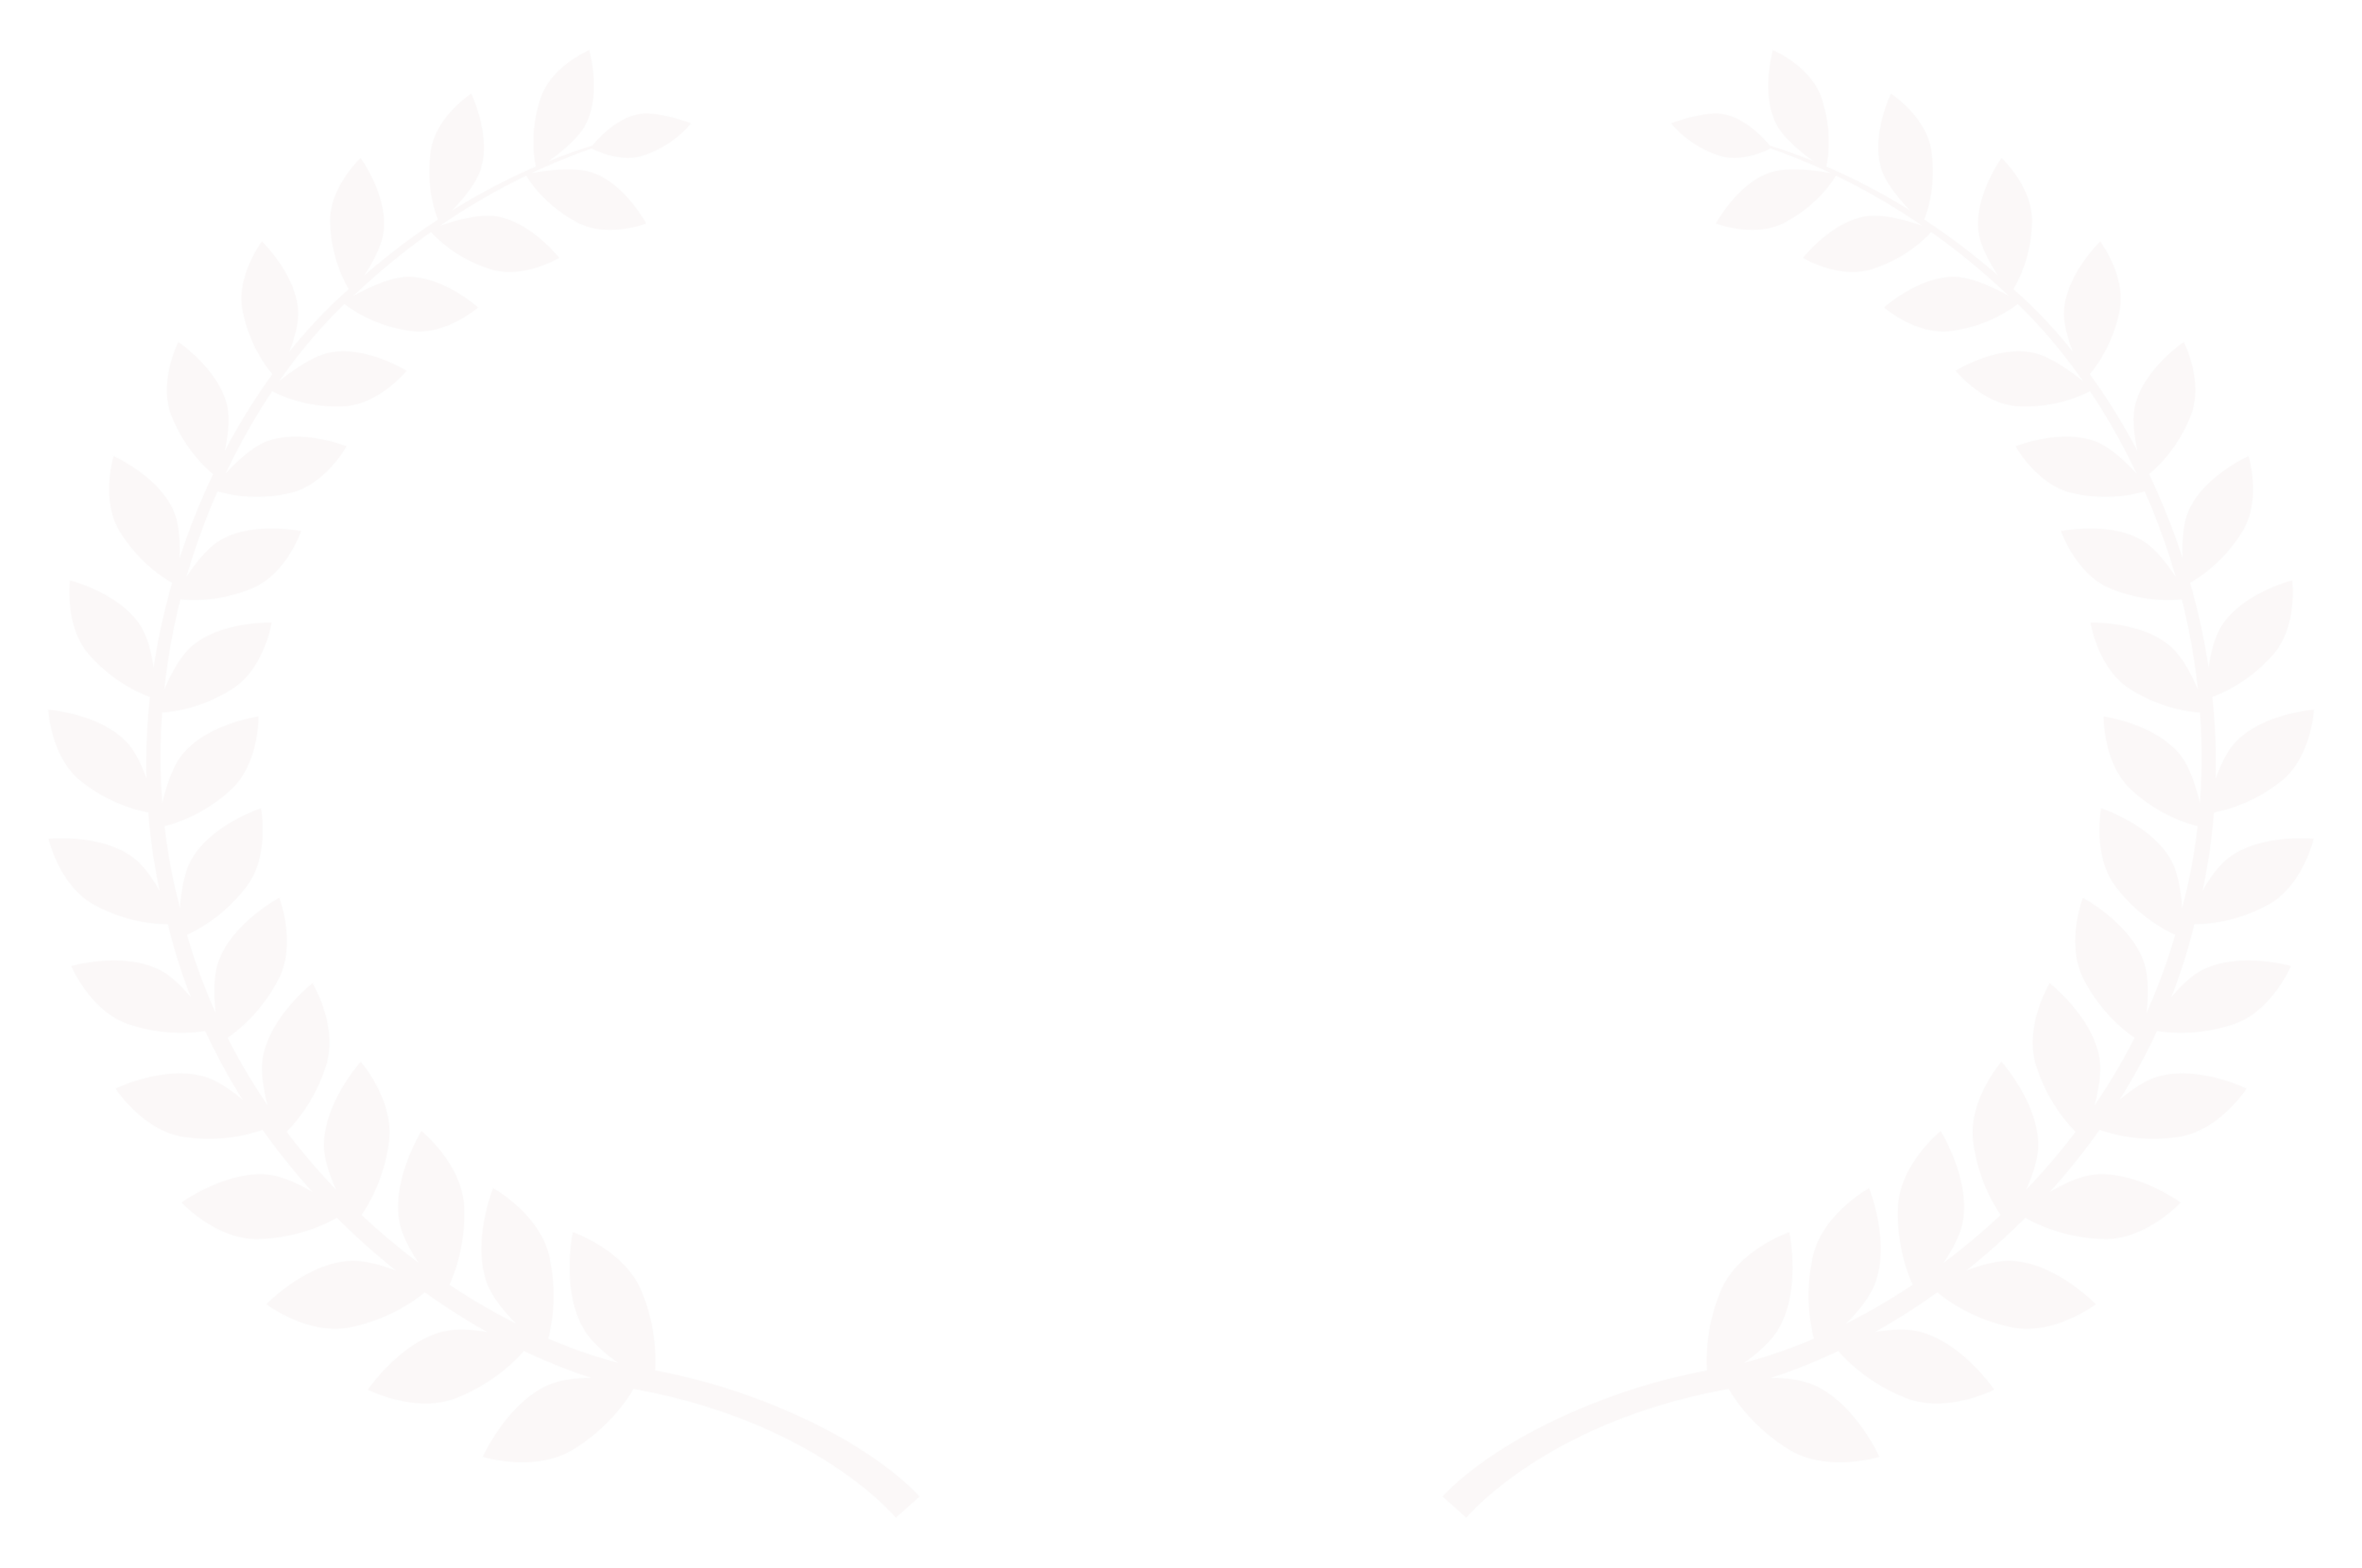 MDIFF 2017 laurelWhite.png